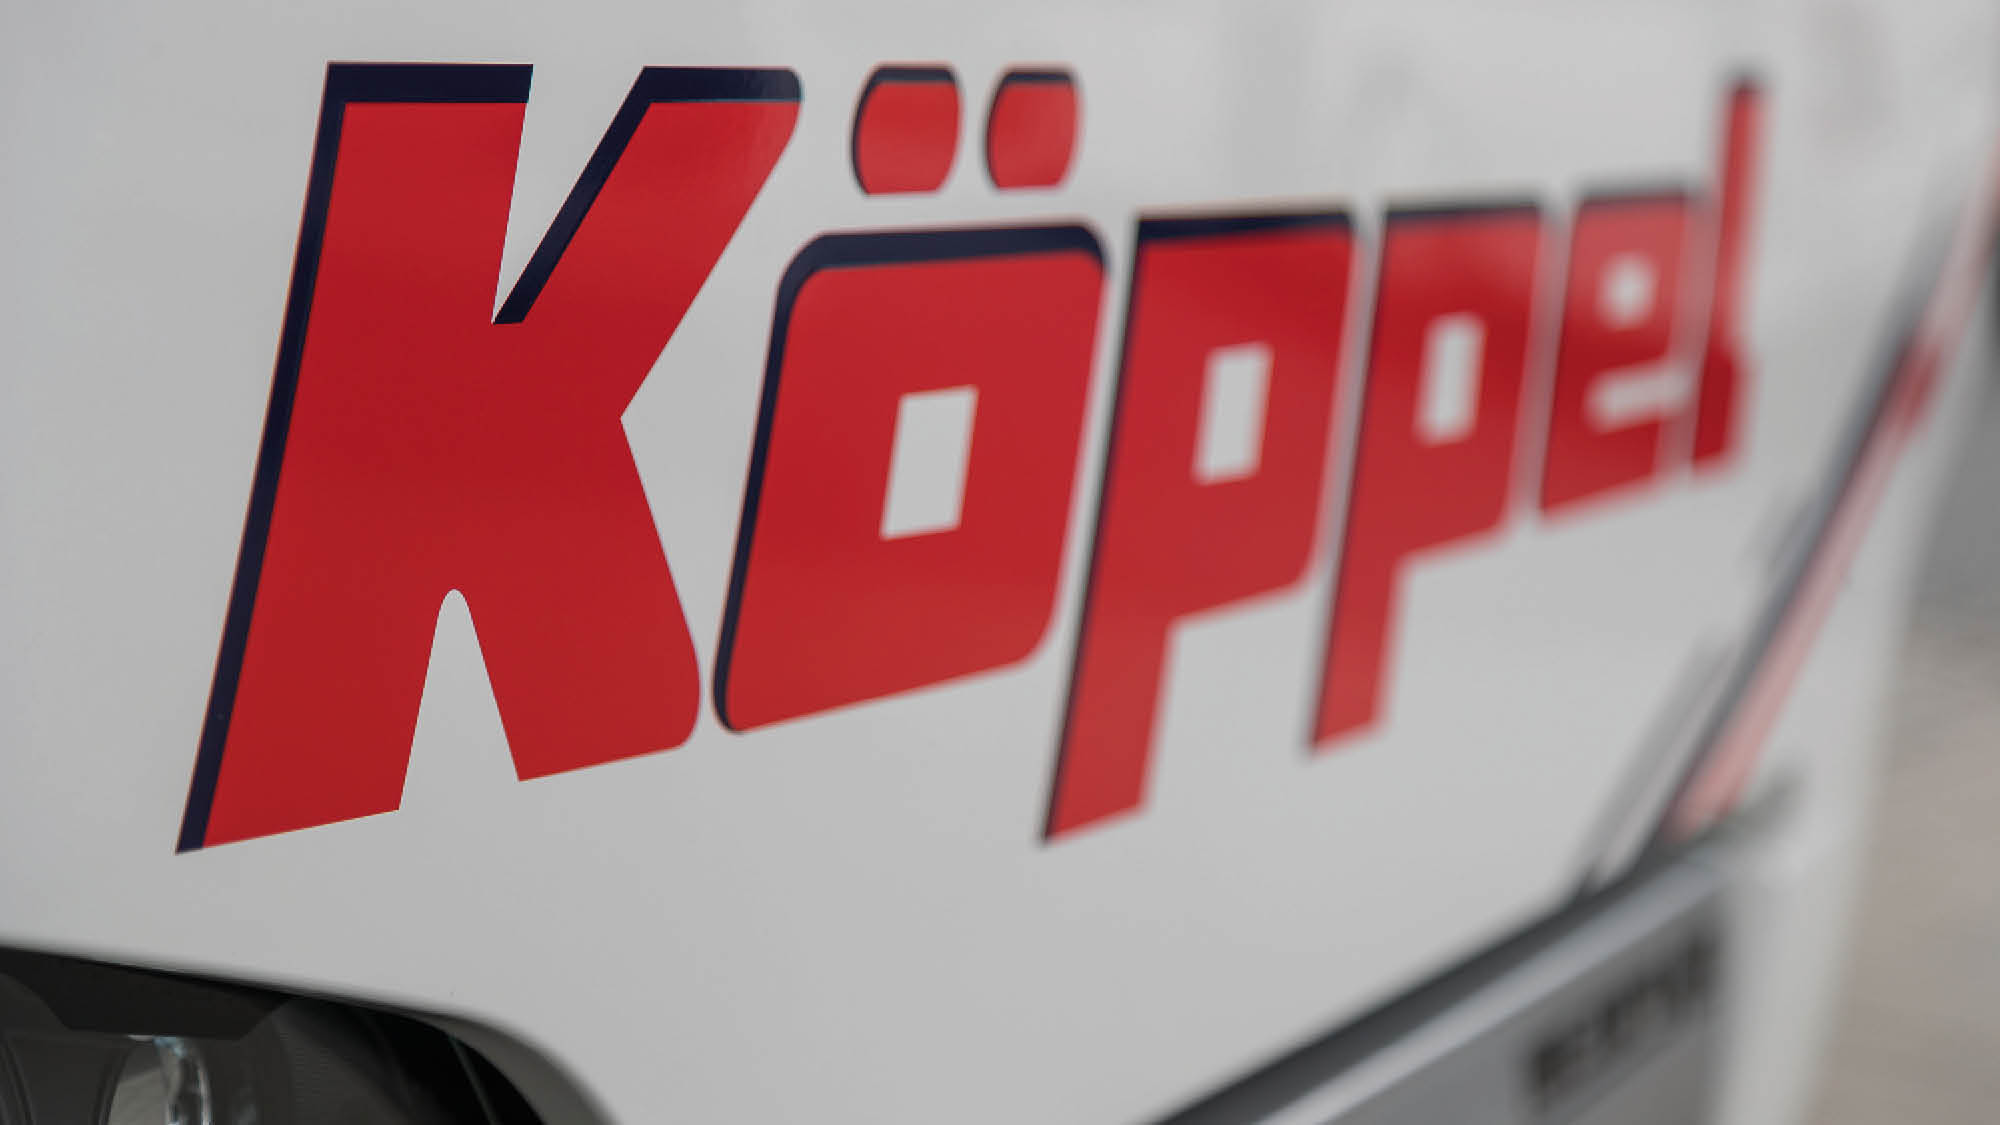 Köppel - Ellwangen - Website - Bus - 2019-12 - 05